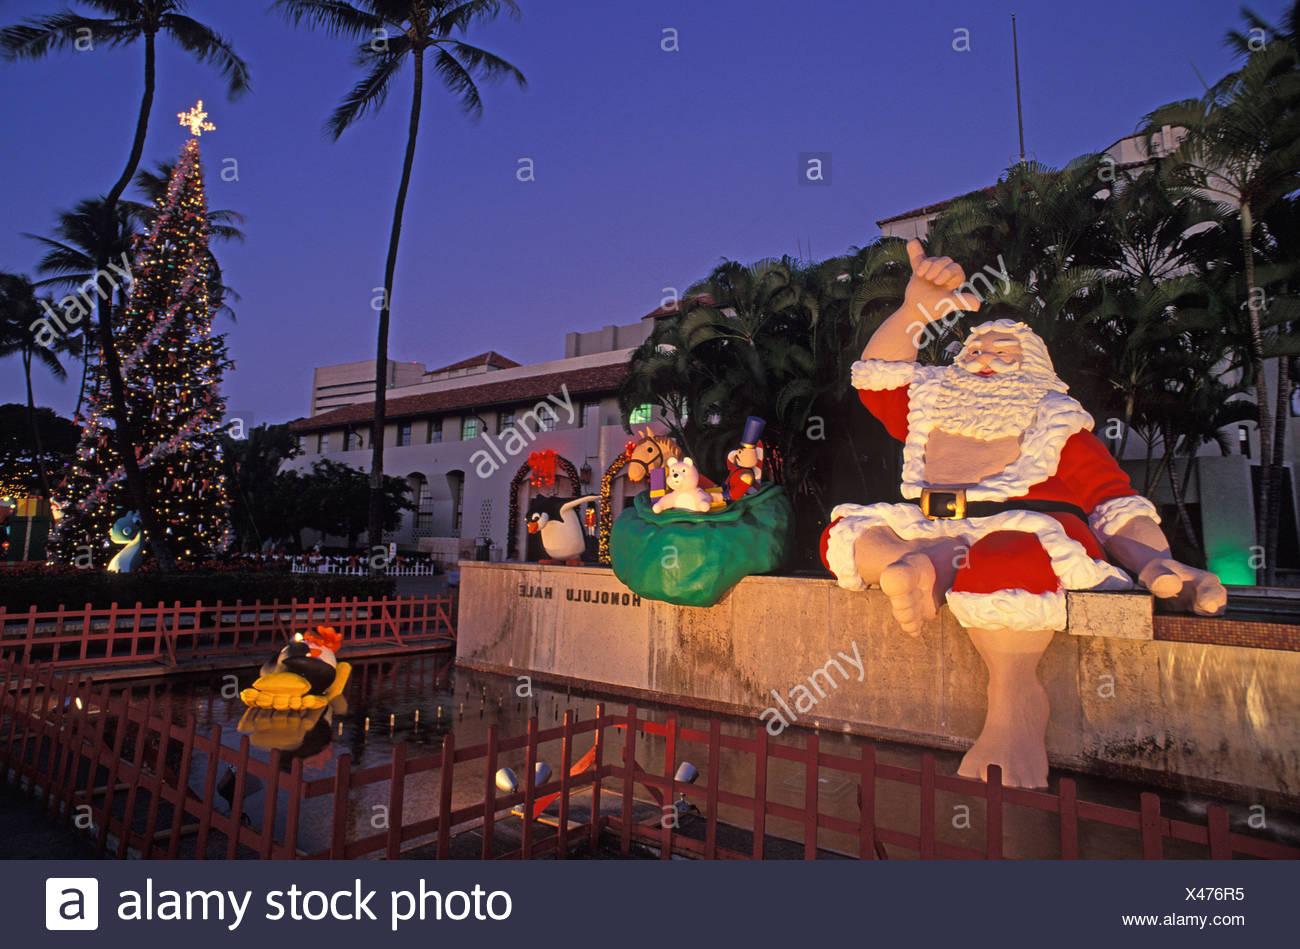 Honolulu Hale Christmas 2021 Twilight View Of Hawaiian Santa Christmas Tree At Honolulu Hale Stock Photo Alamy